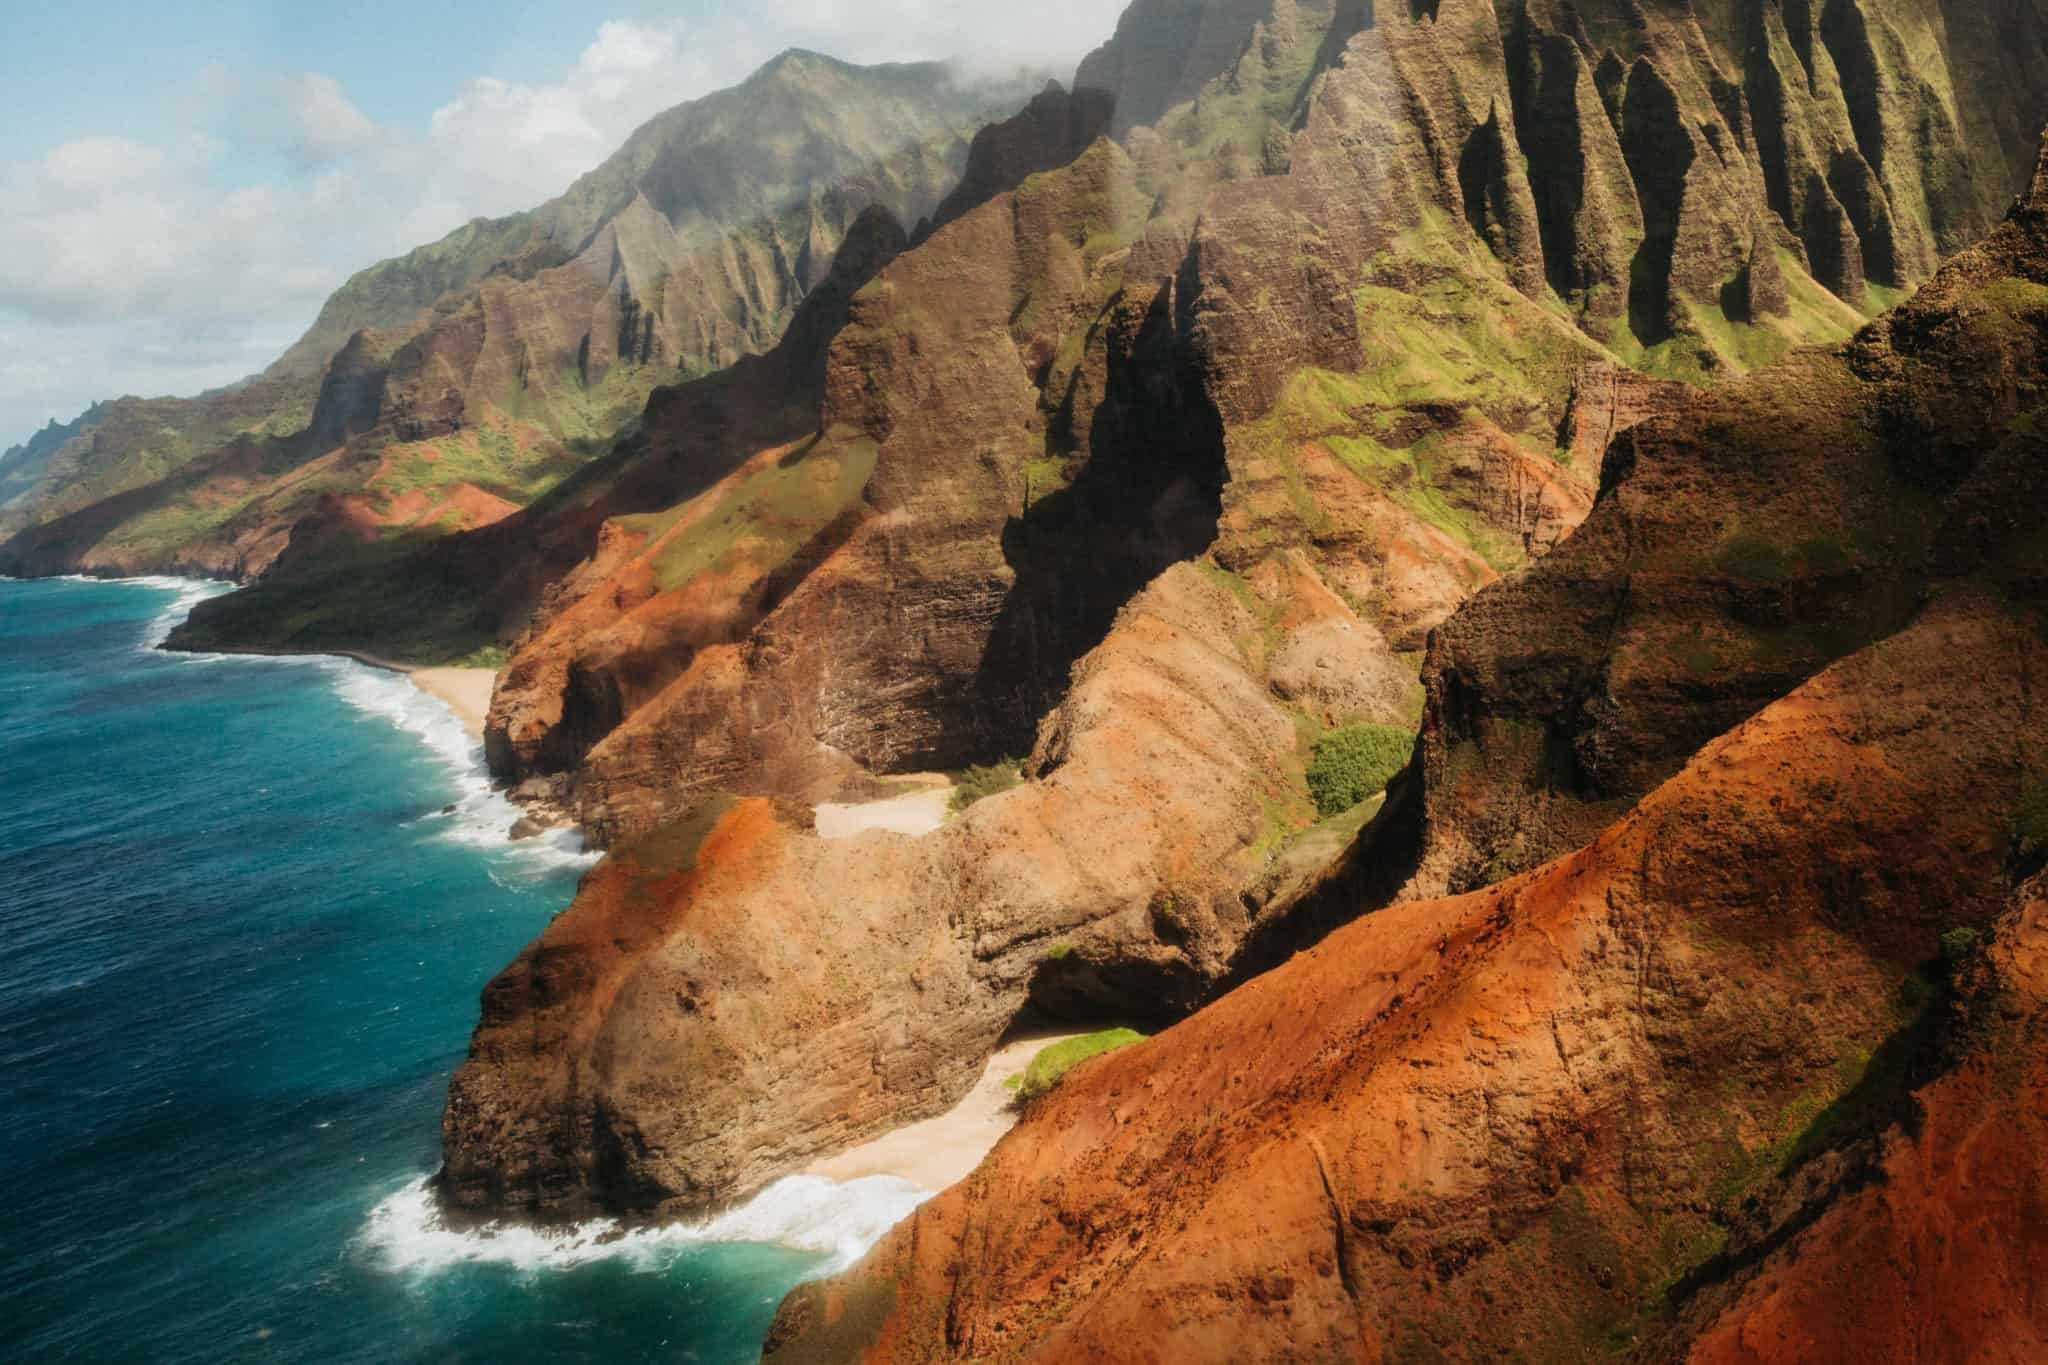 Kauai Helicopter Tour View: Na Pali Coast